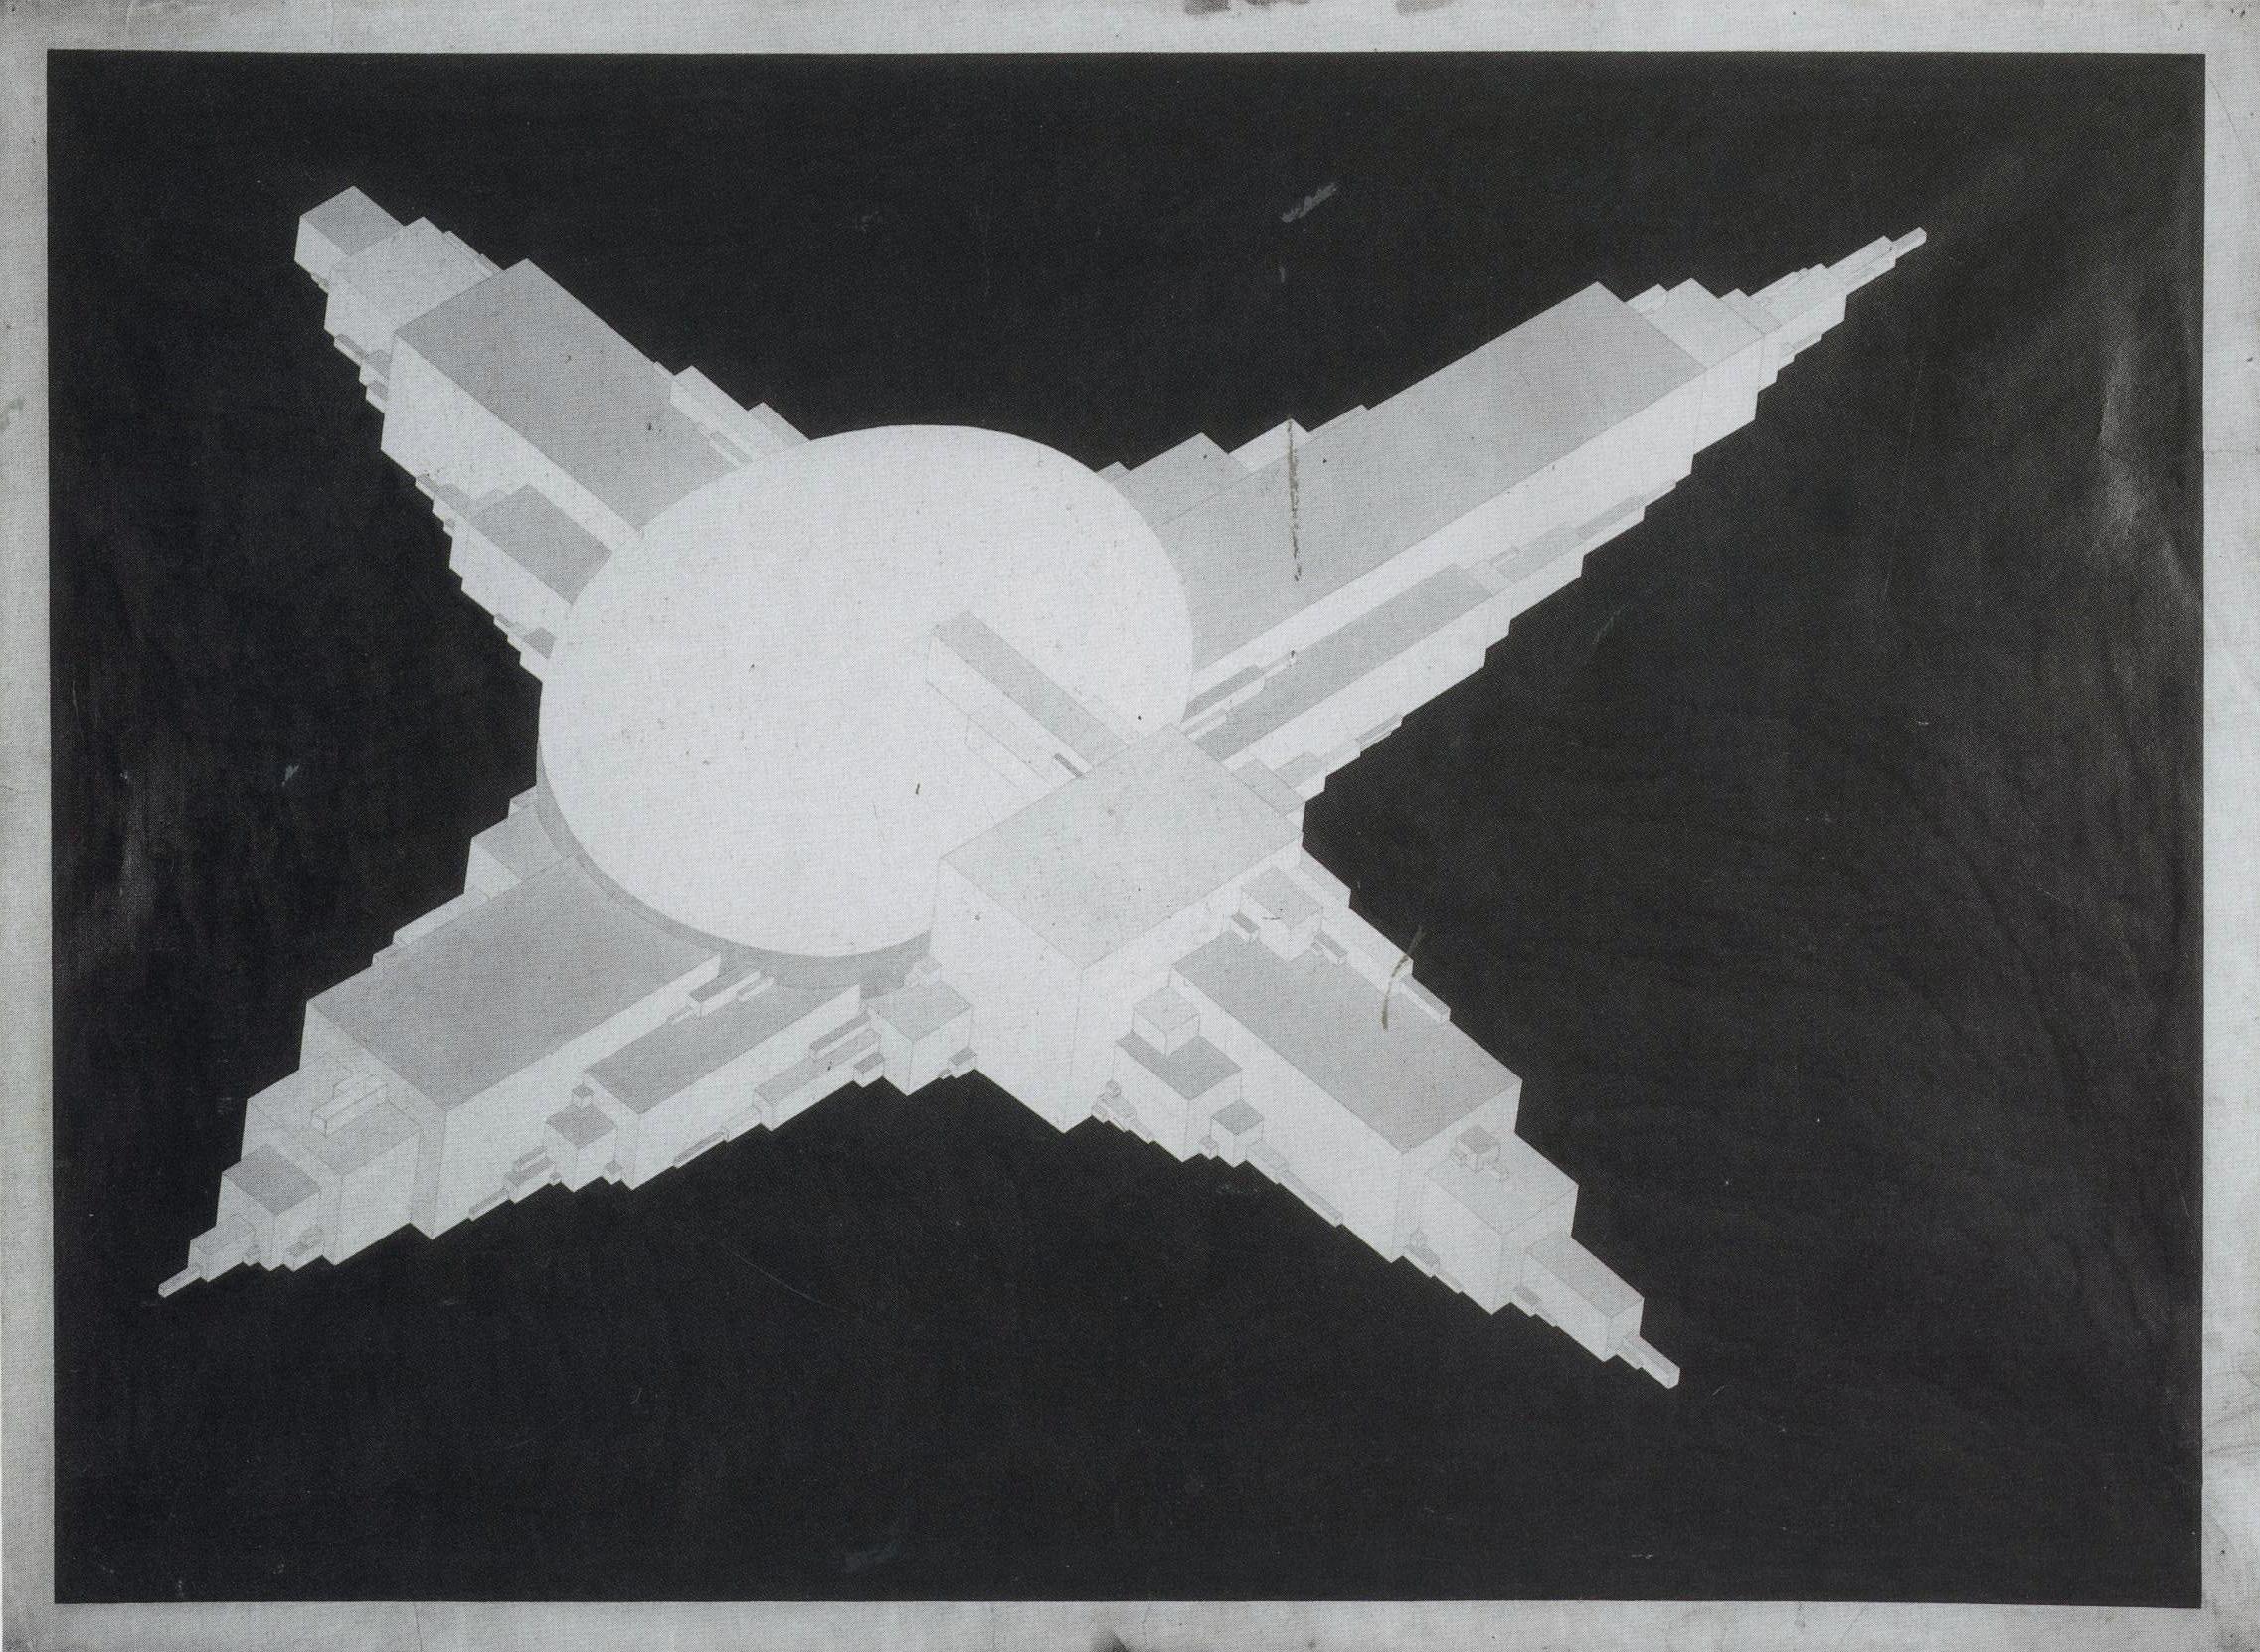 Il'ia Chashnik - Supremolet Suprematist Planit 1927-1928 India ink on paper 62,4 x 84,6 cm1